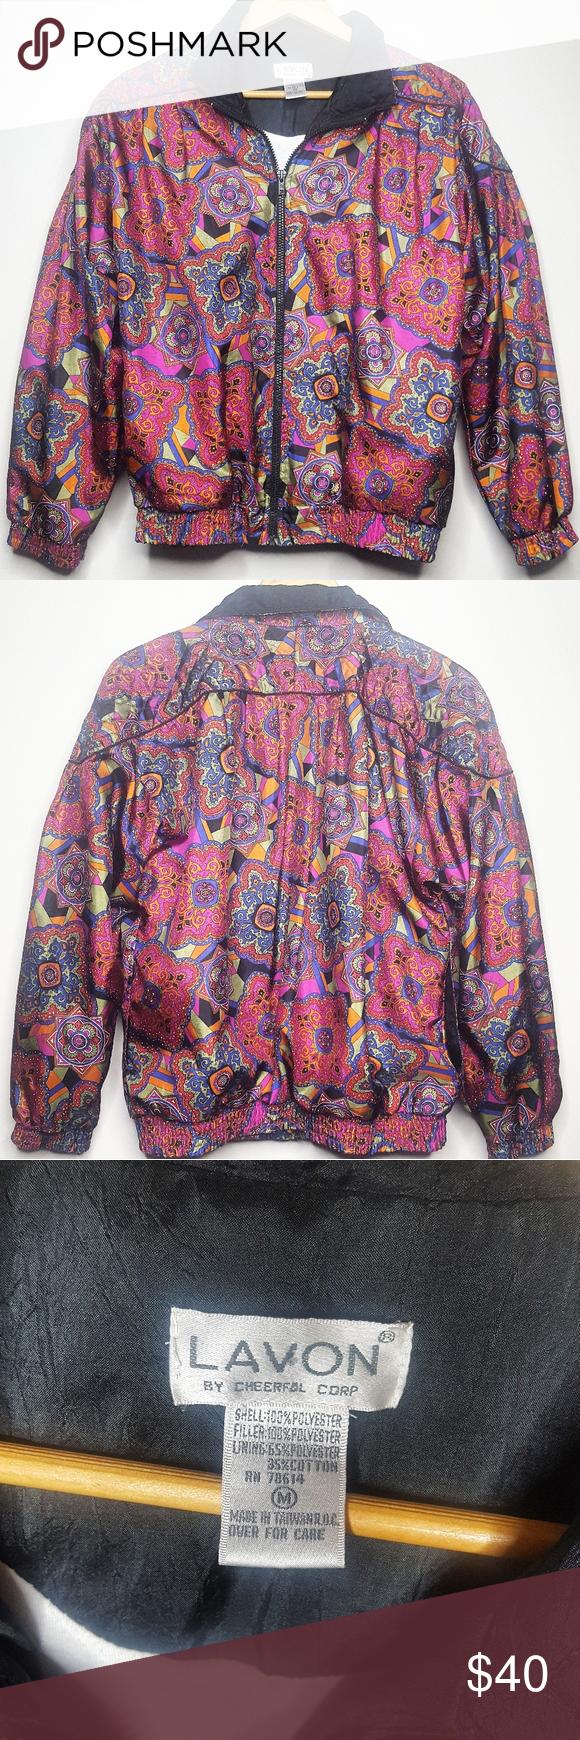 Vintage 80s 90s Lavon Paisley Bomber Jacket Paisley Jacket Bomber Jacket Vintage Vintage Jacket [ 1740 x 580 Pixel ]